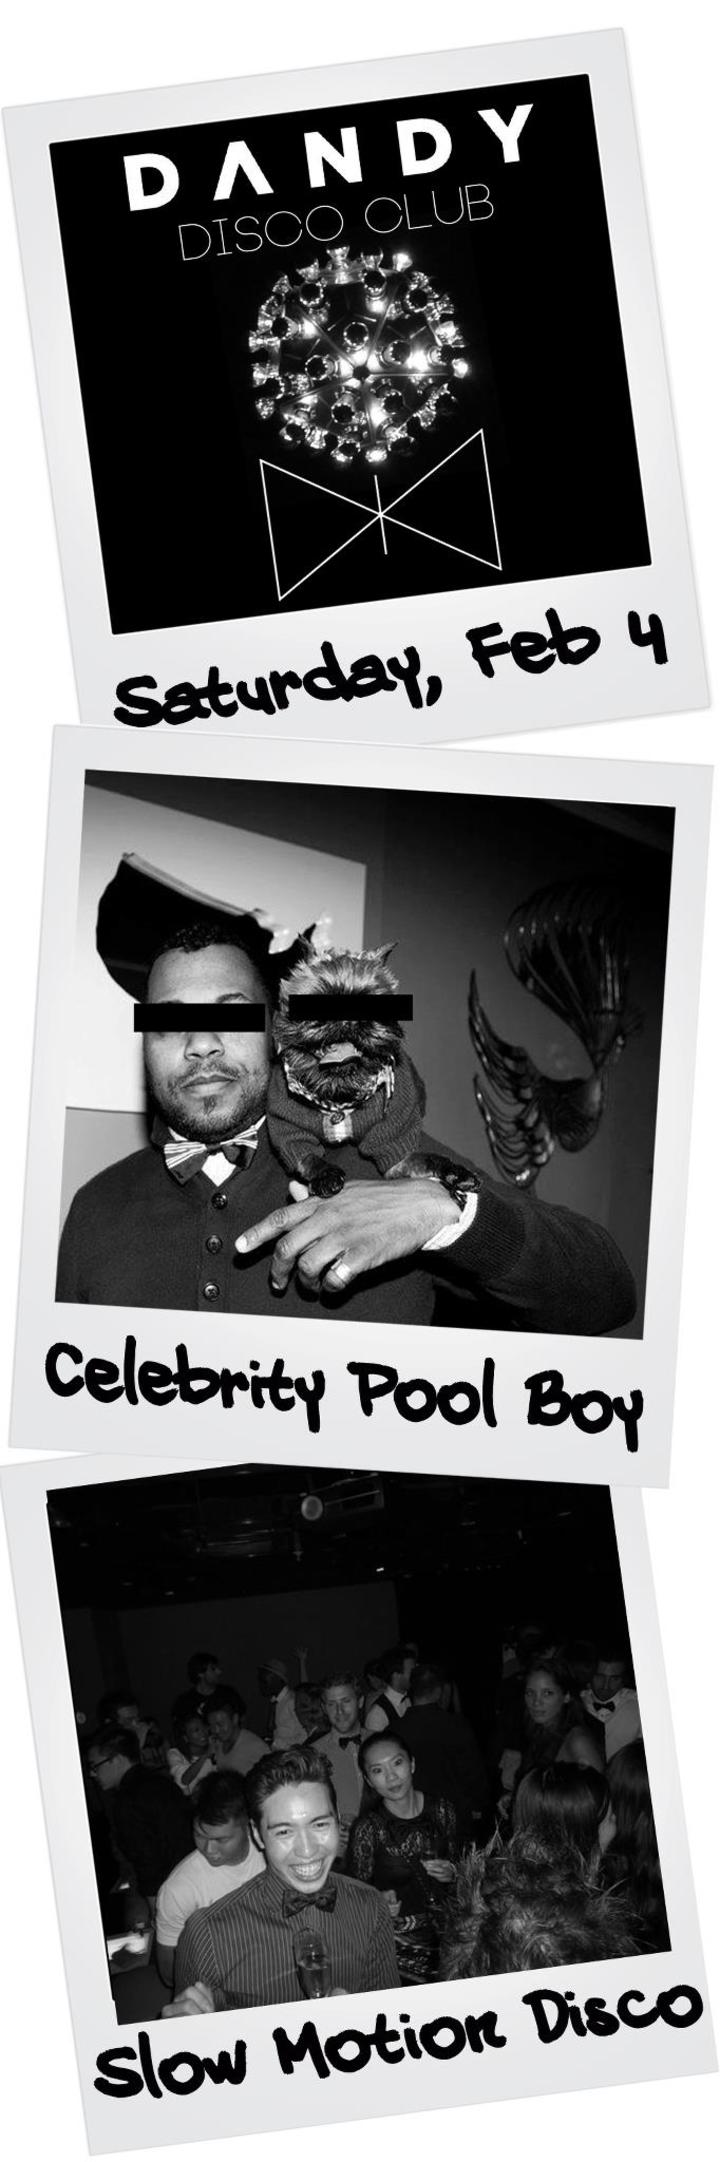 Celebrity Pool Boy Tour Dates